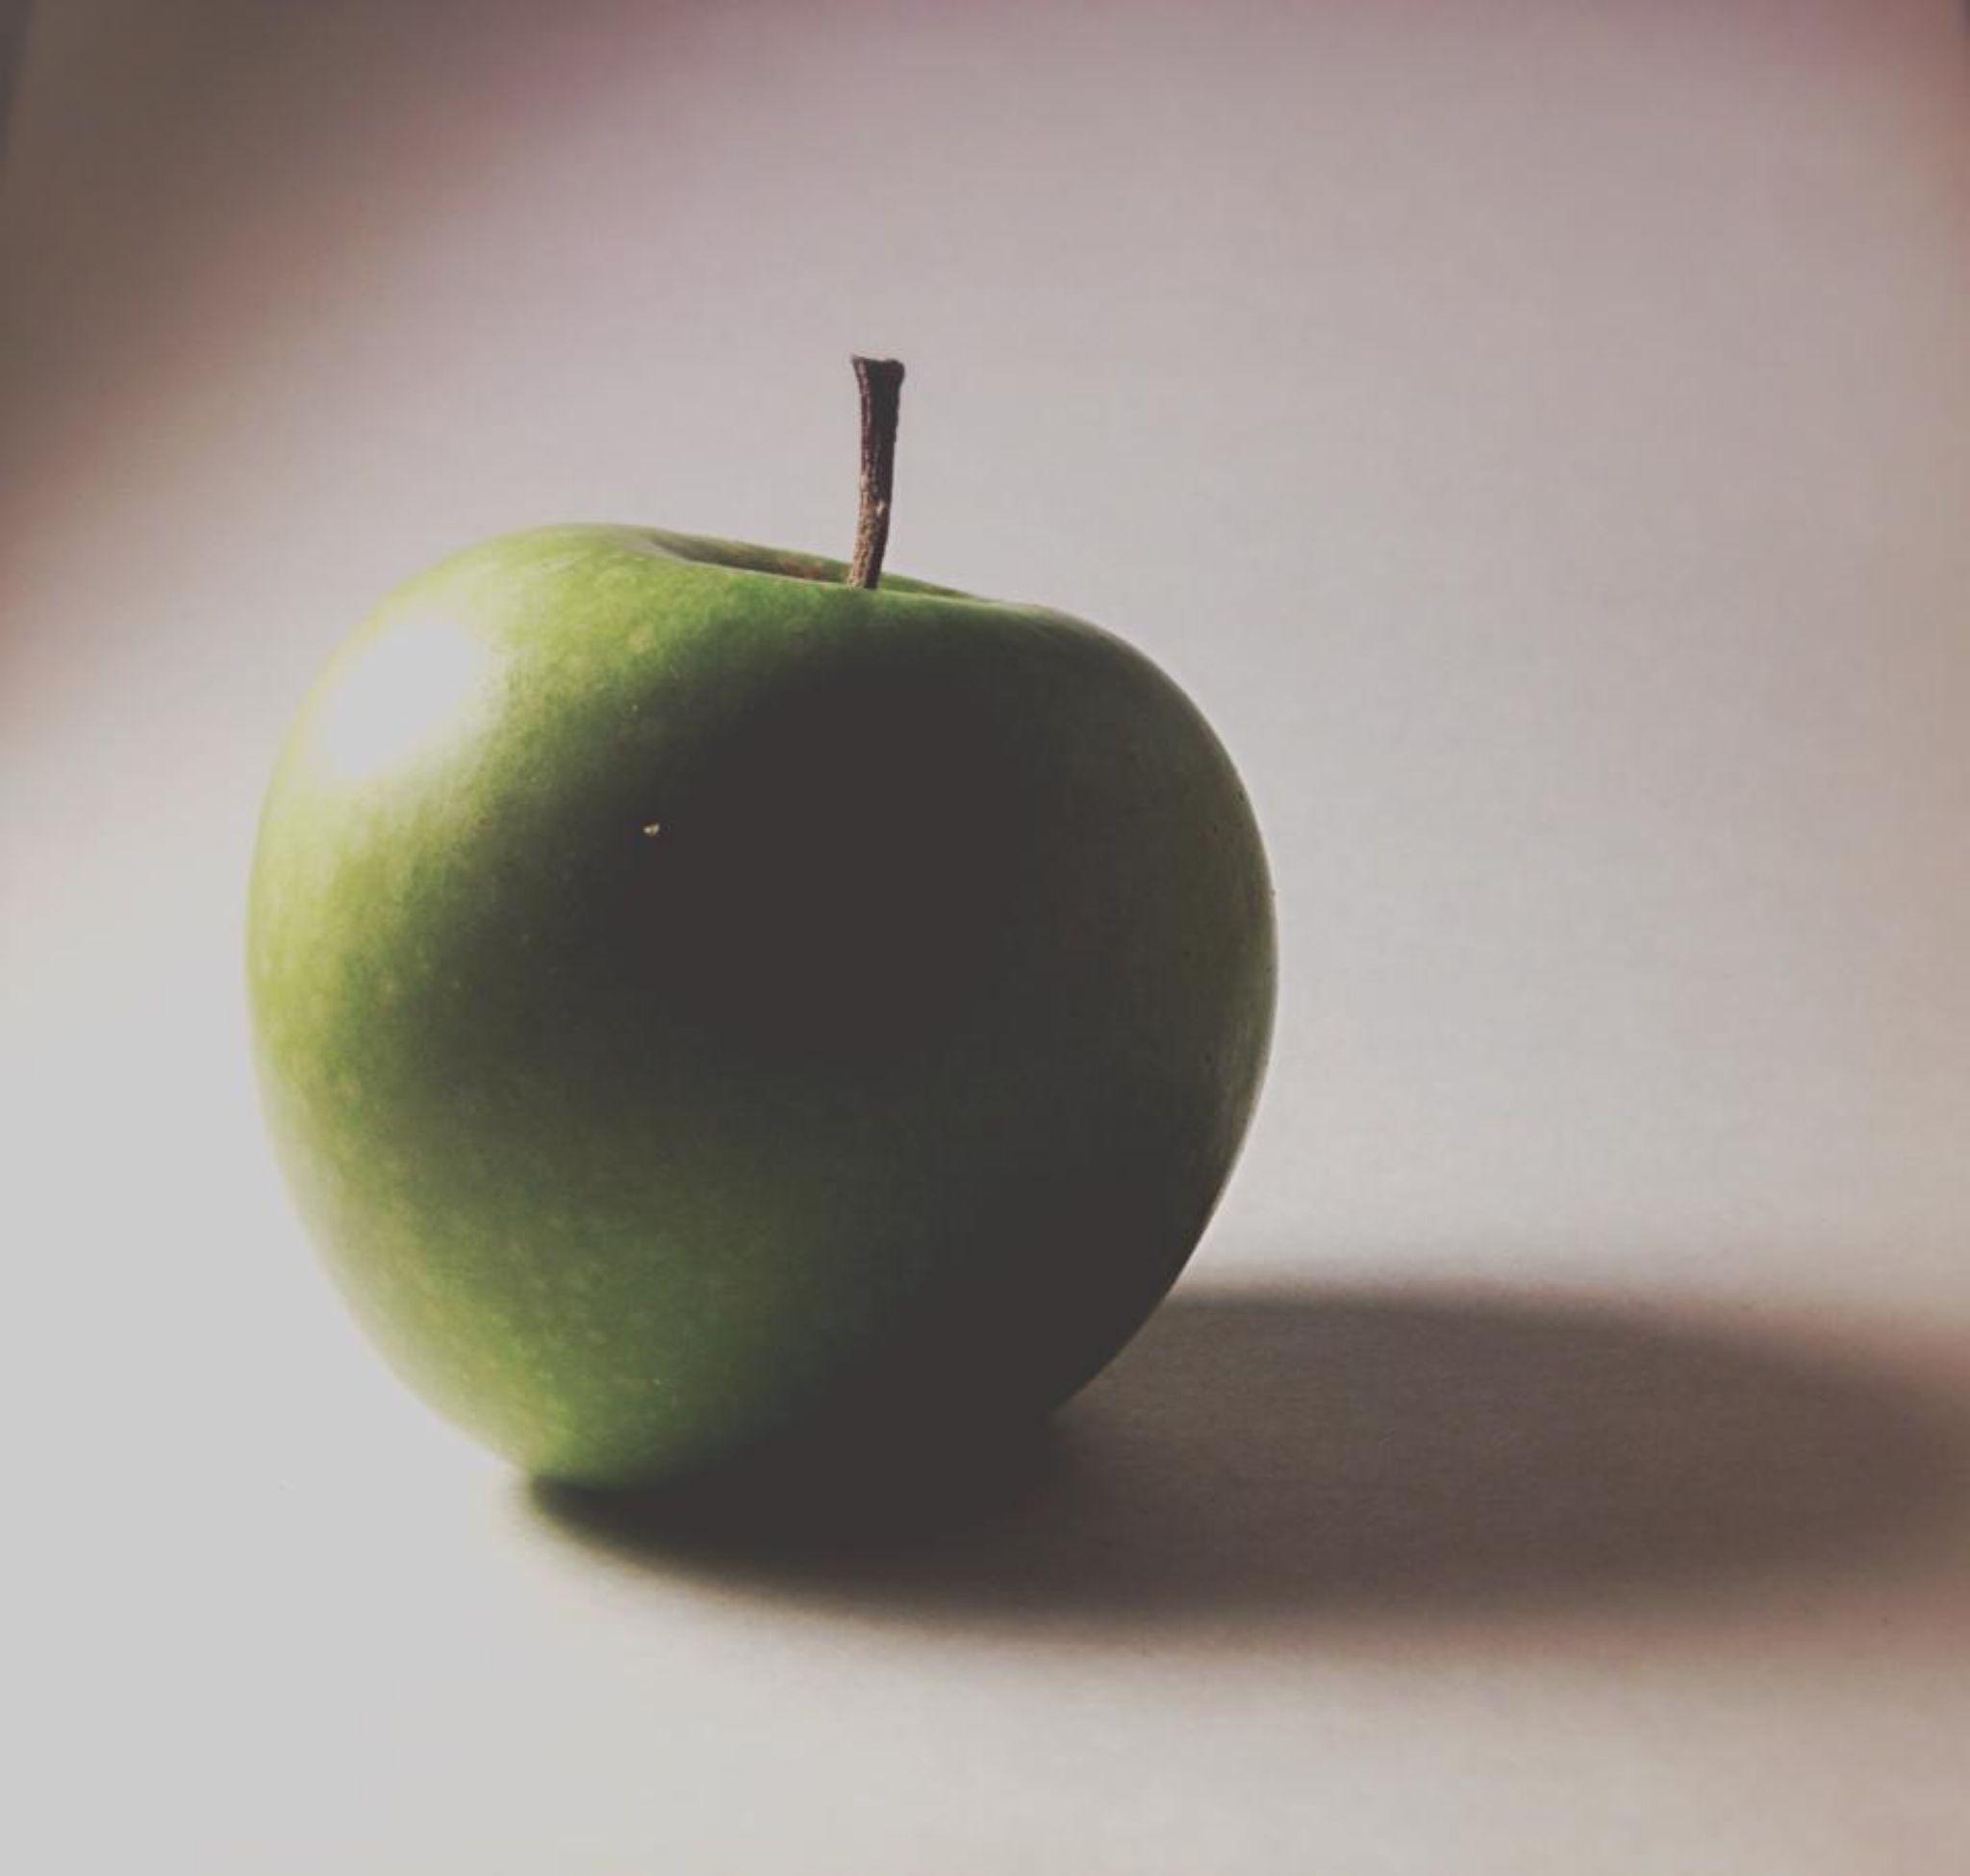 Apple by mitchell.w.harris.3